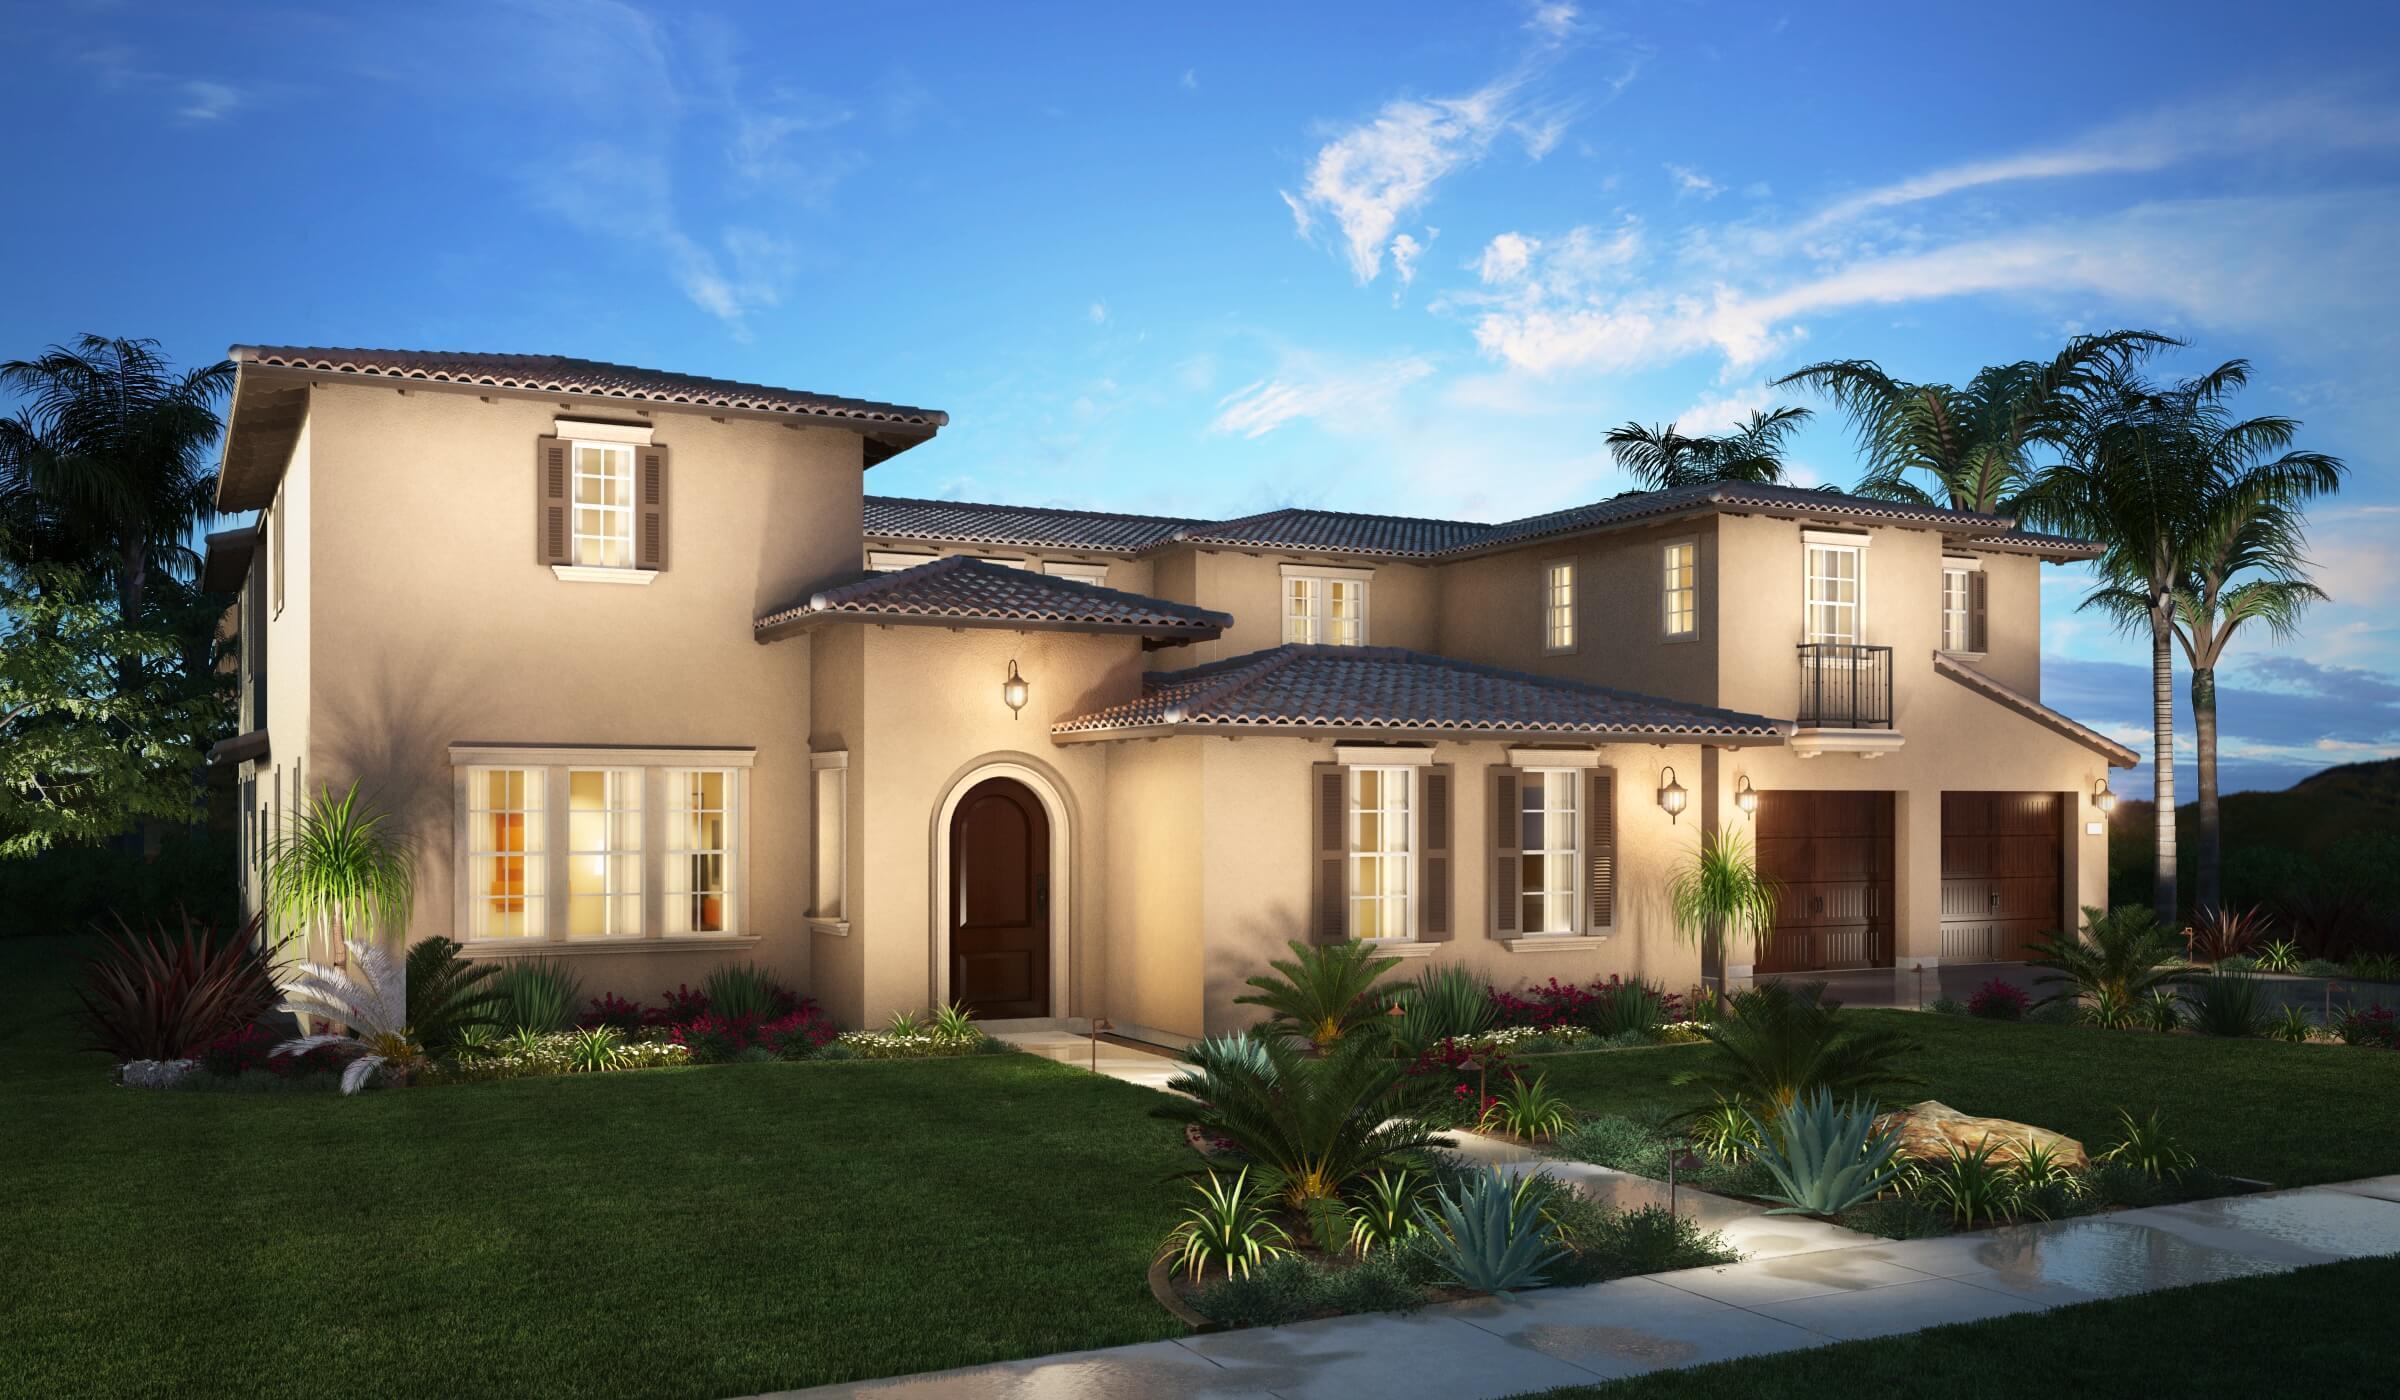 Single Family for Sale at La Colina Estates - Residence 5 1203 Iris Lane Glendora, California 91741 United States